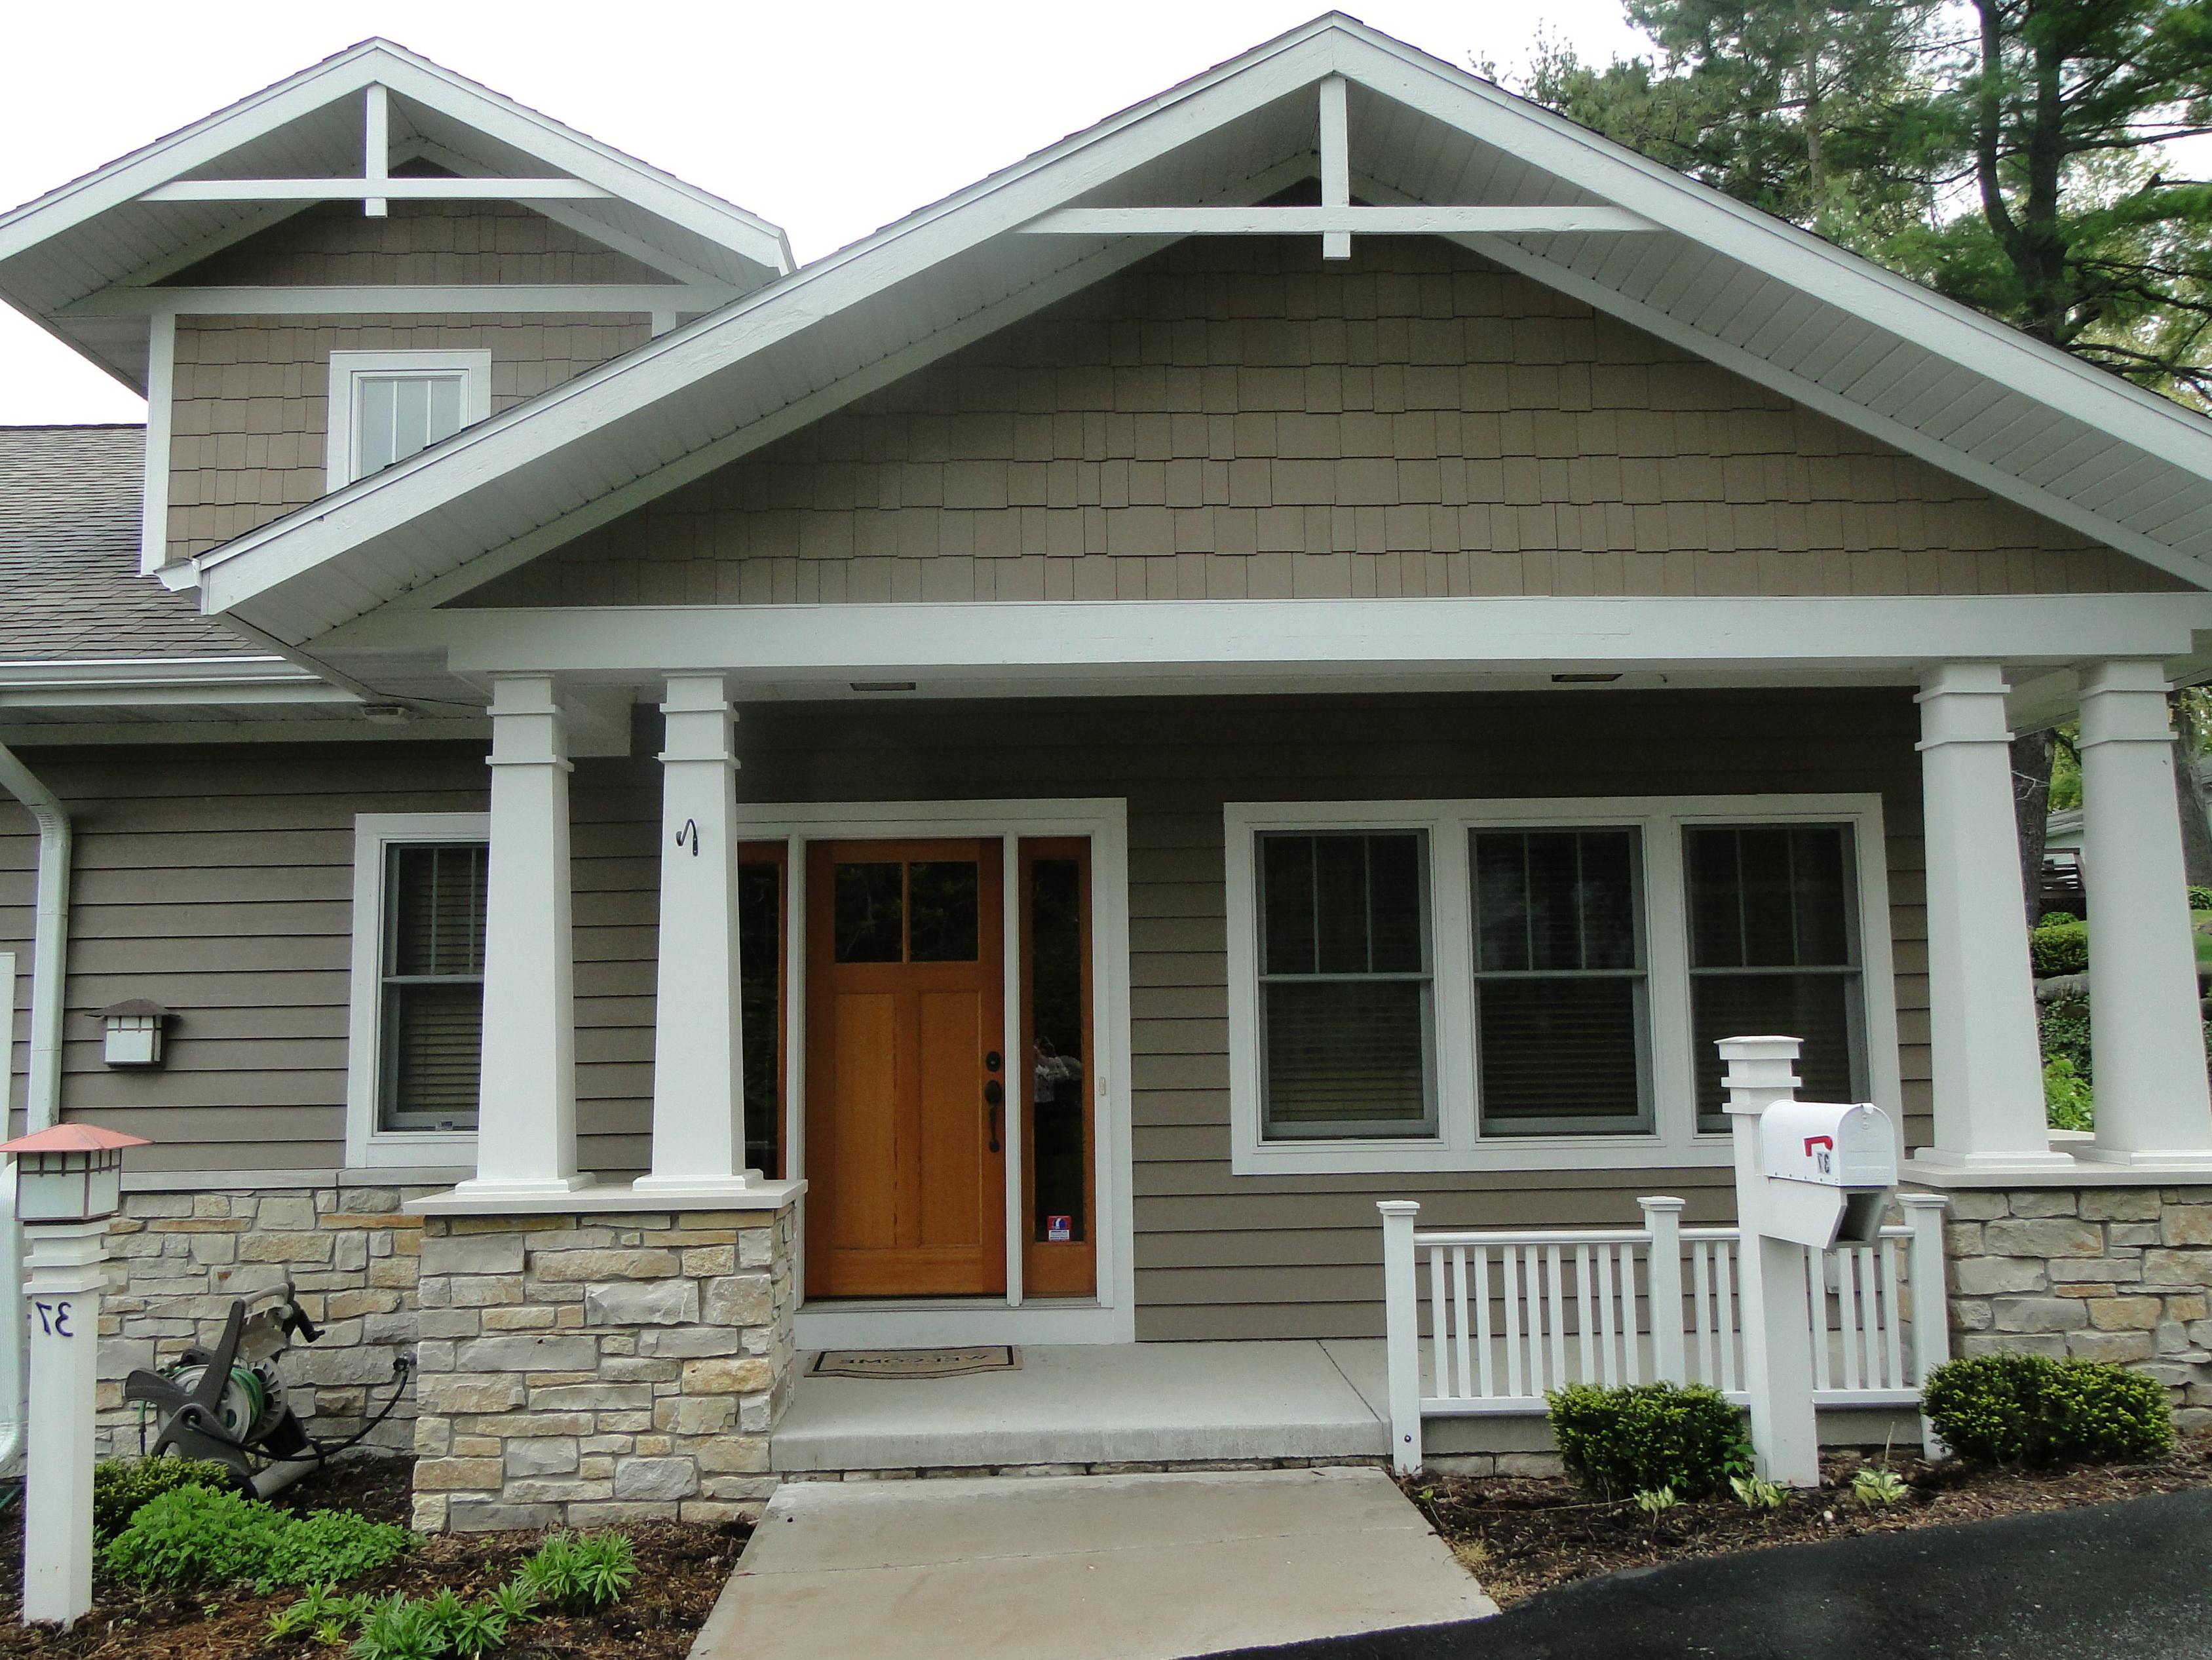 Adding A Porch To A House